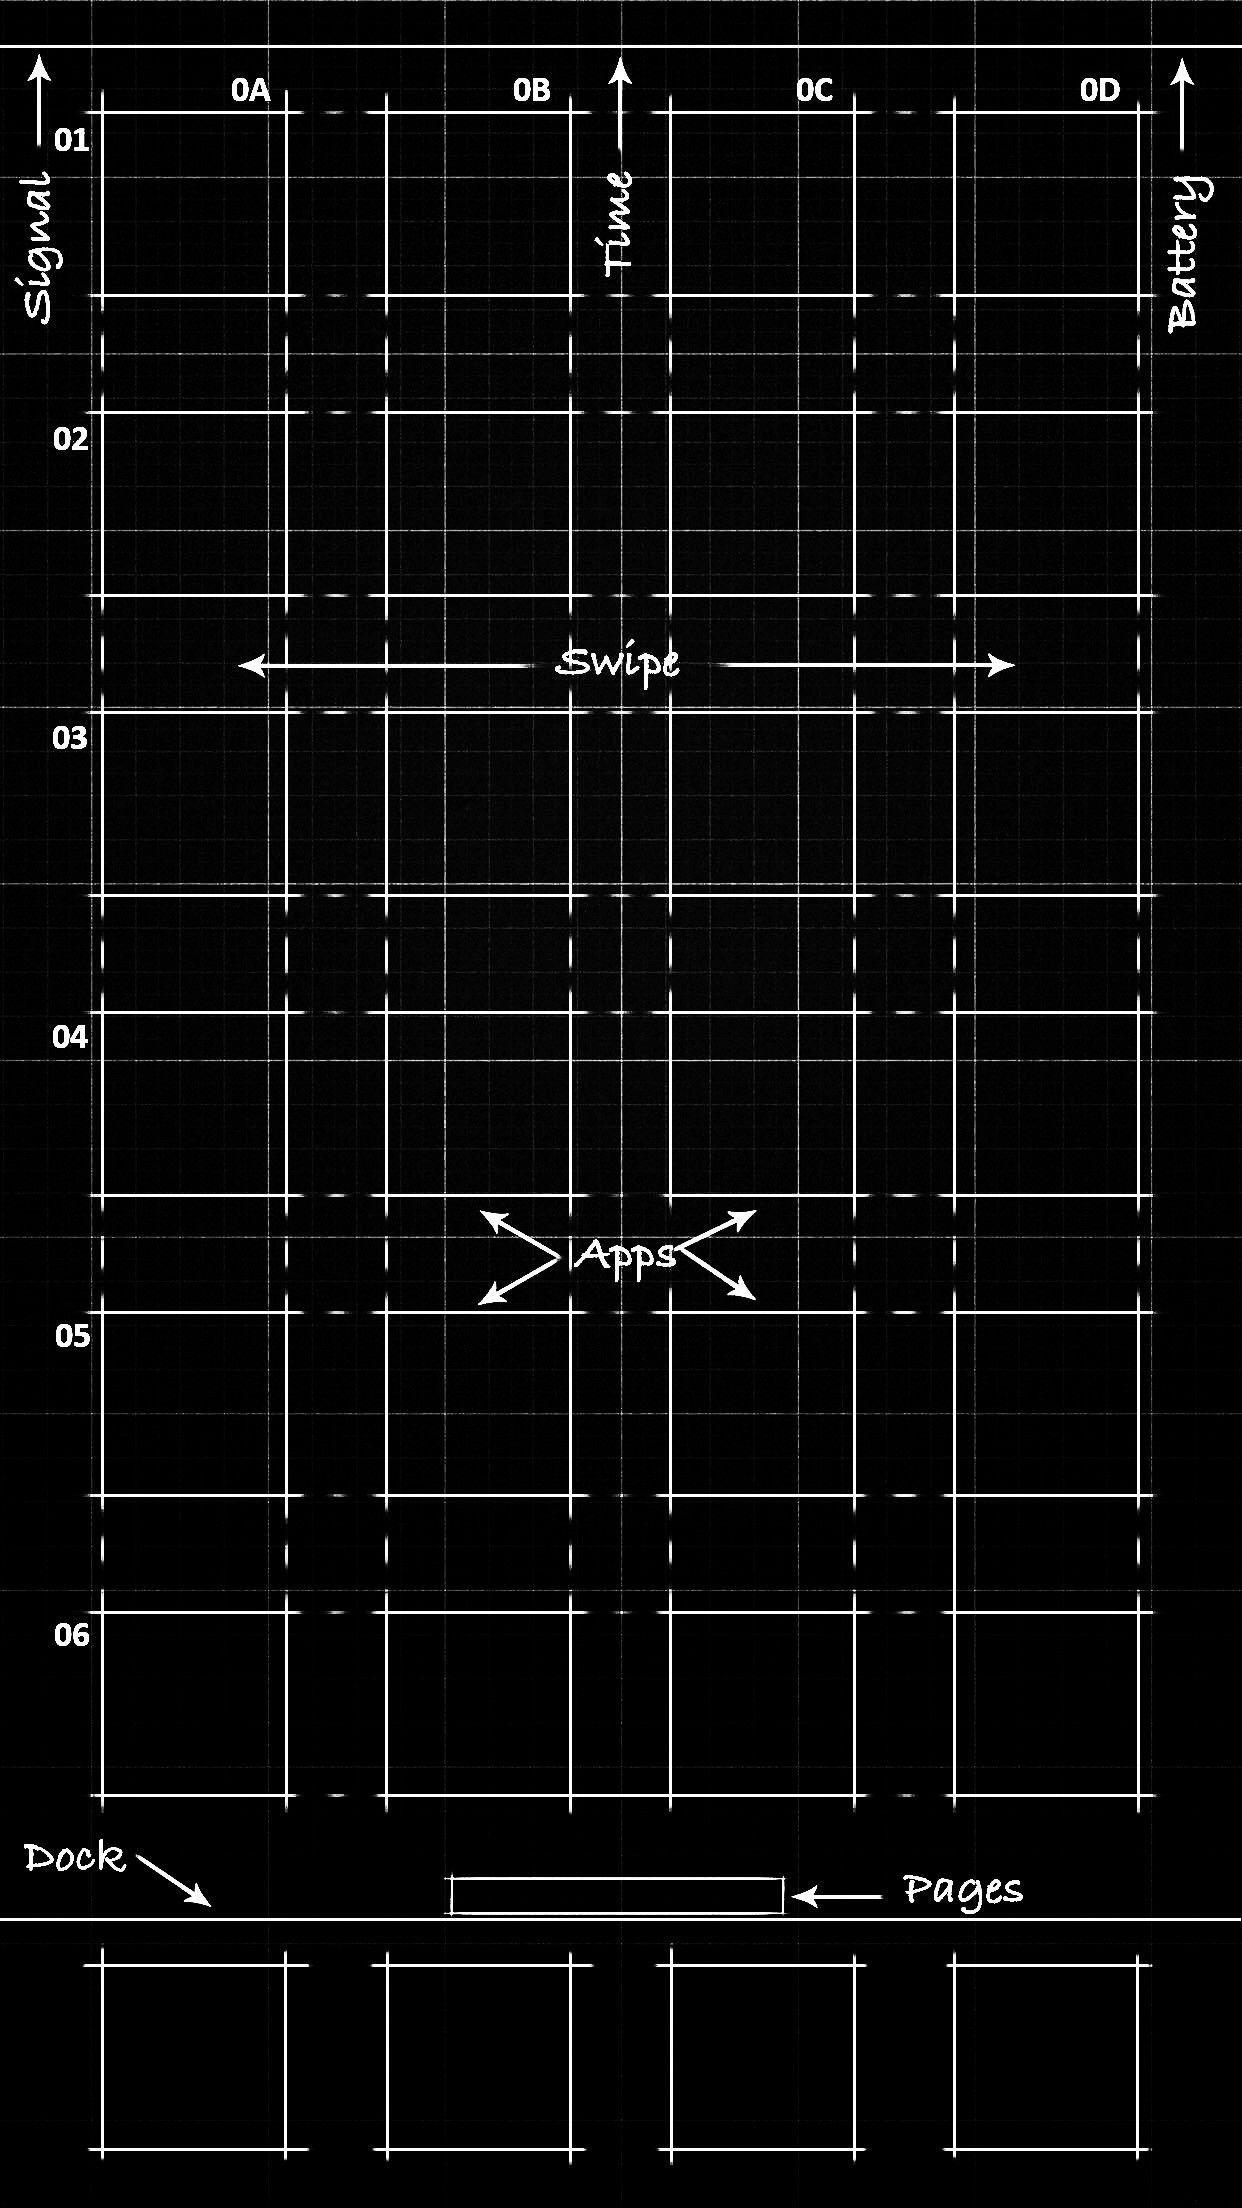 Pin By มน สว พลเม องด On Phone Wallpaper Android Wallpaper Black